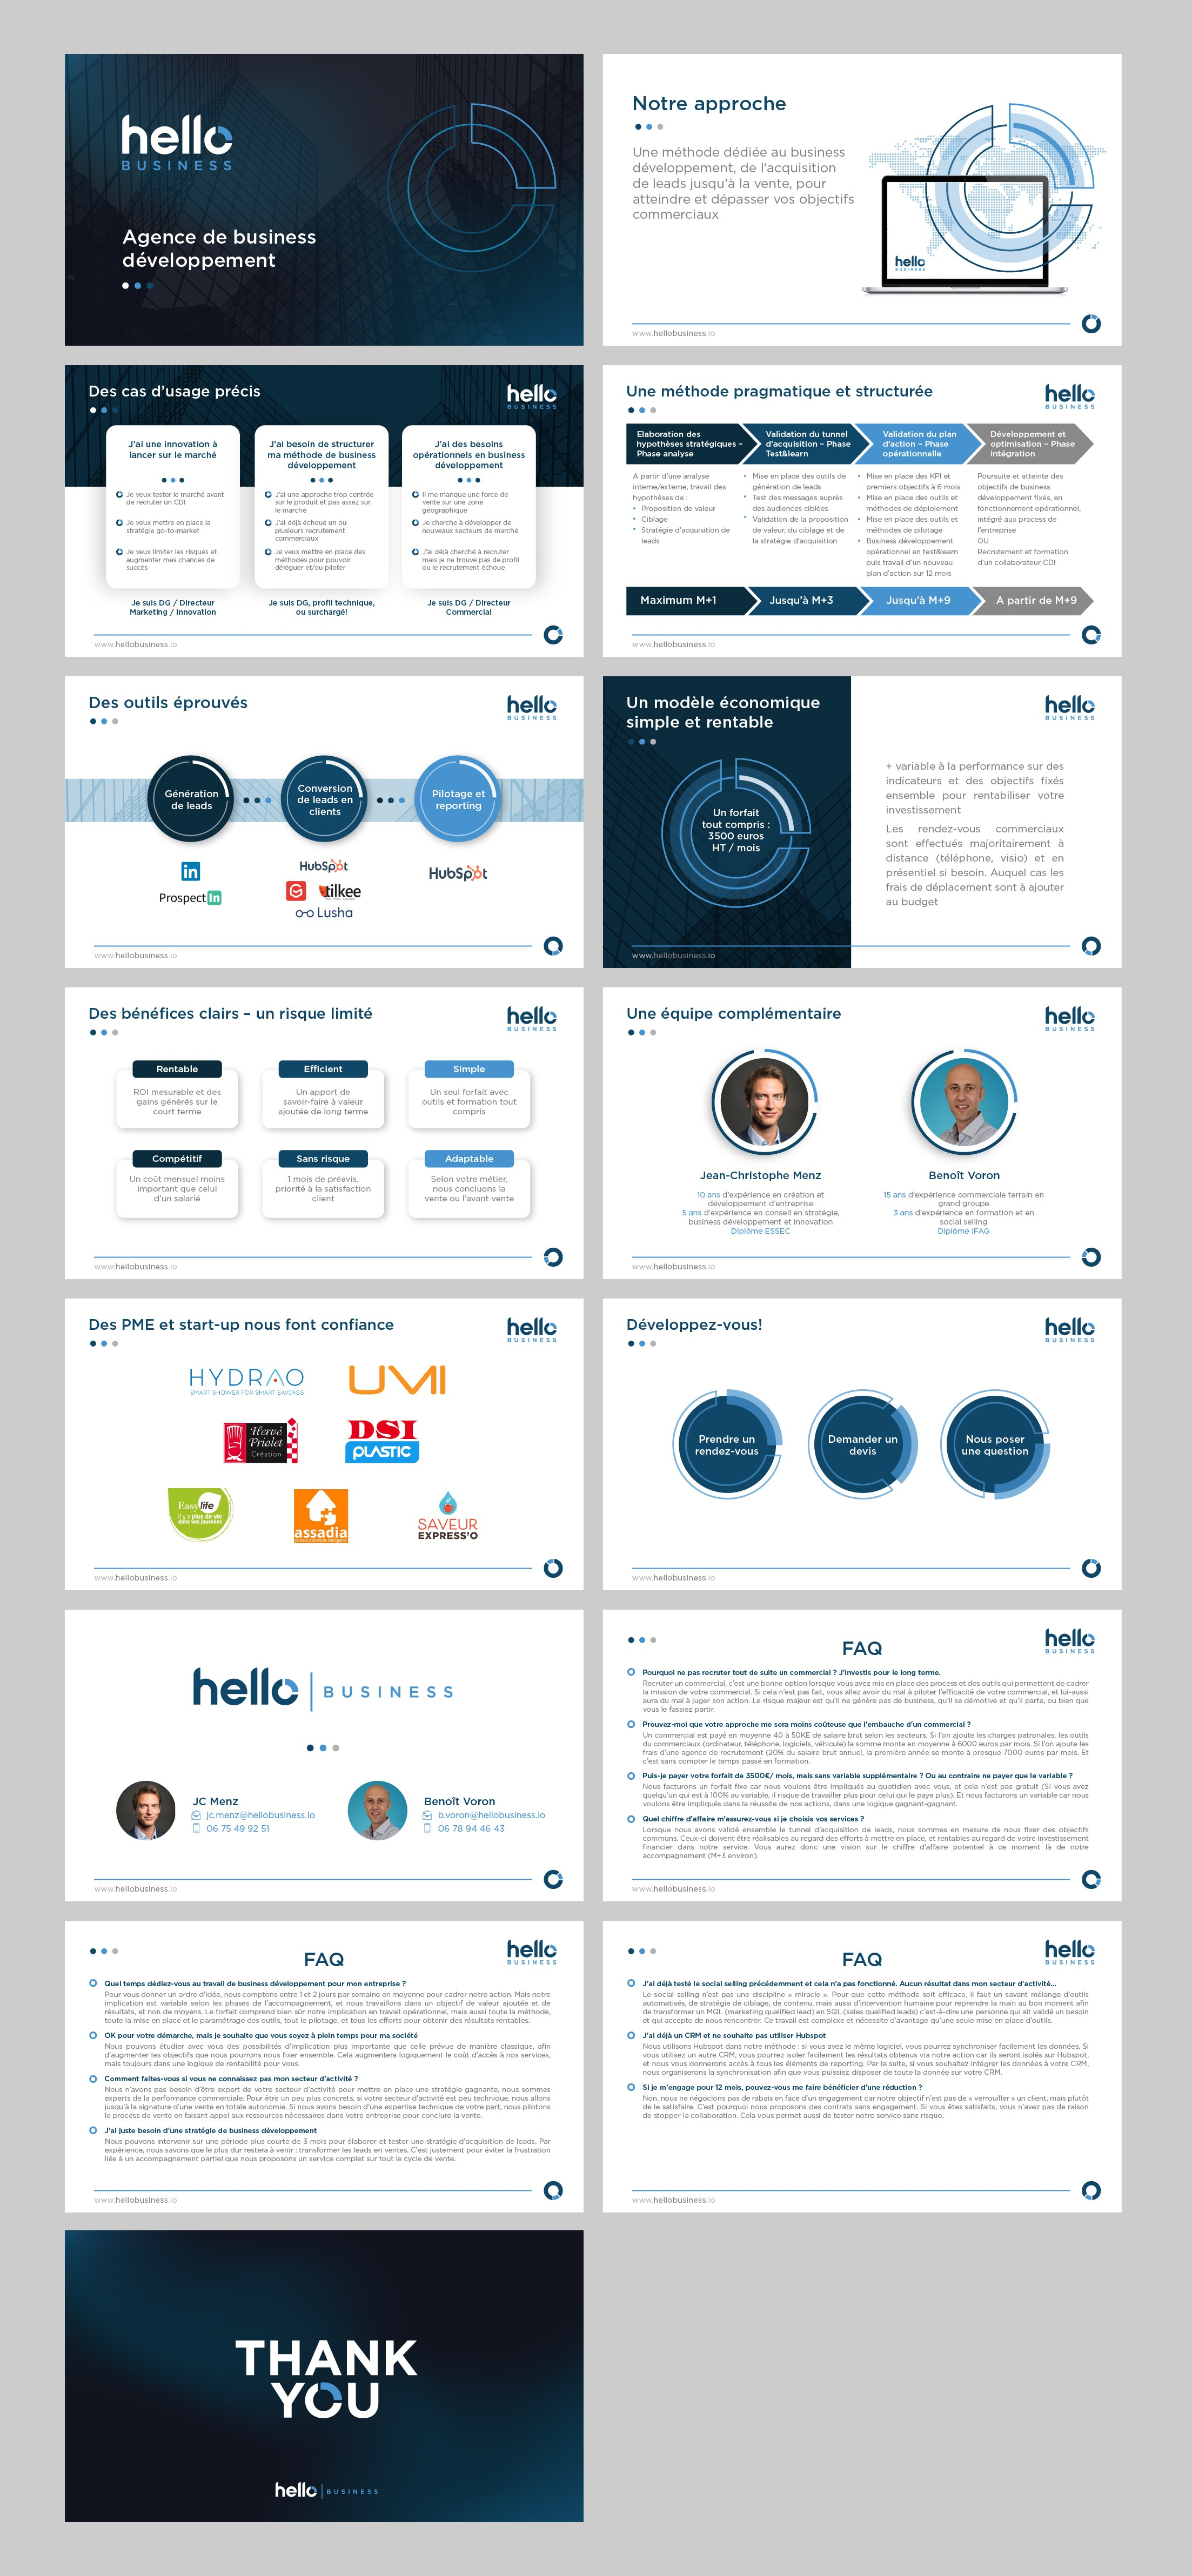 Hello Business powerpoint presentation